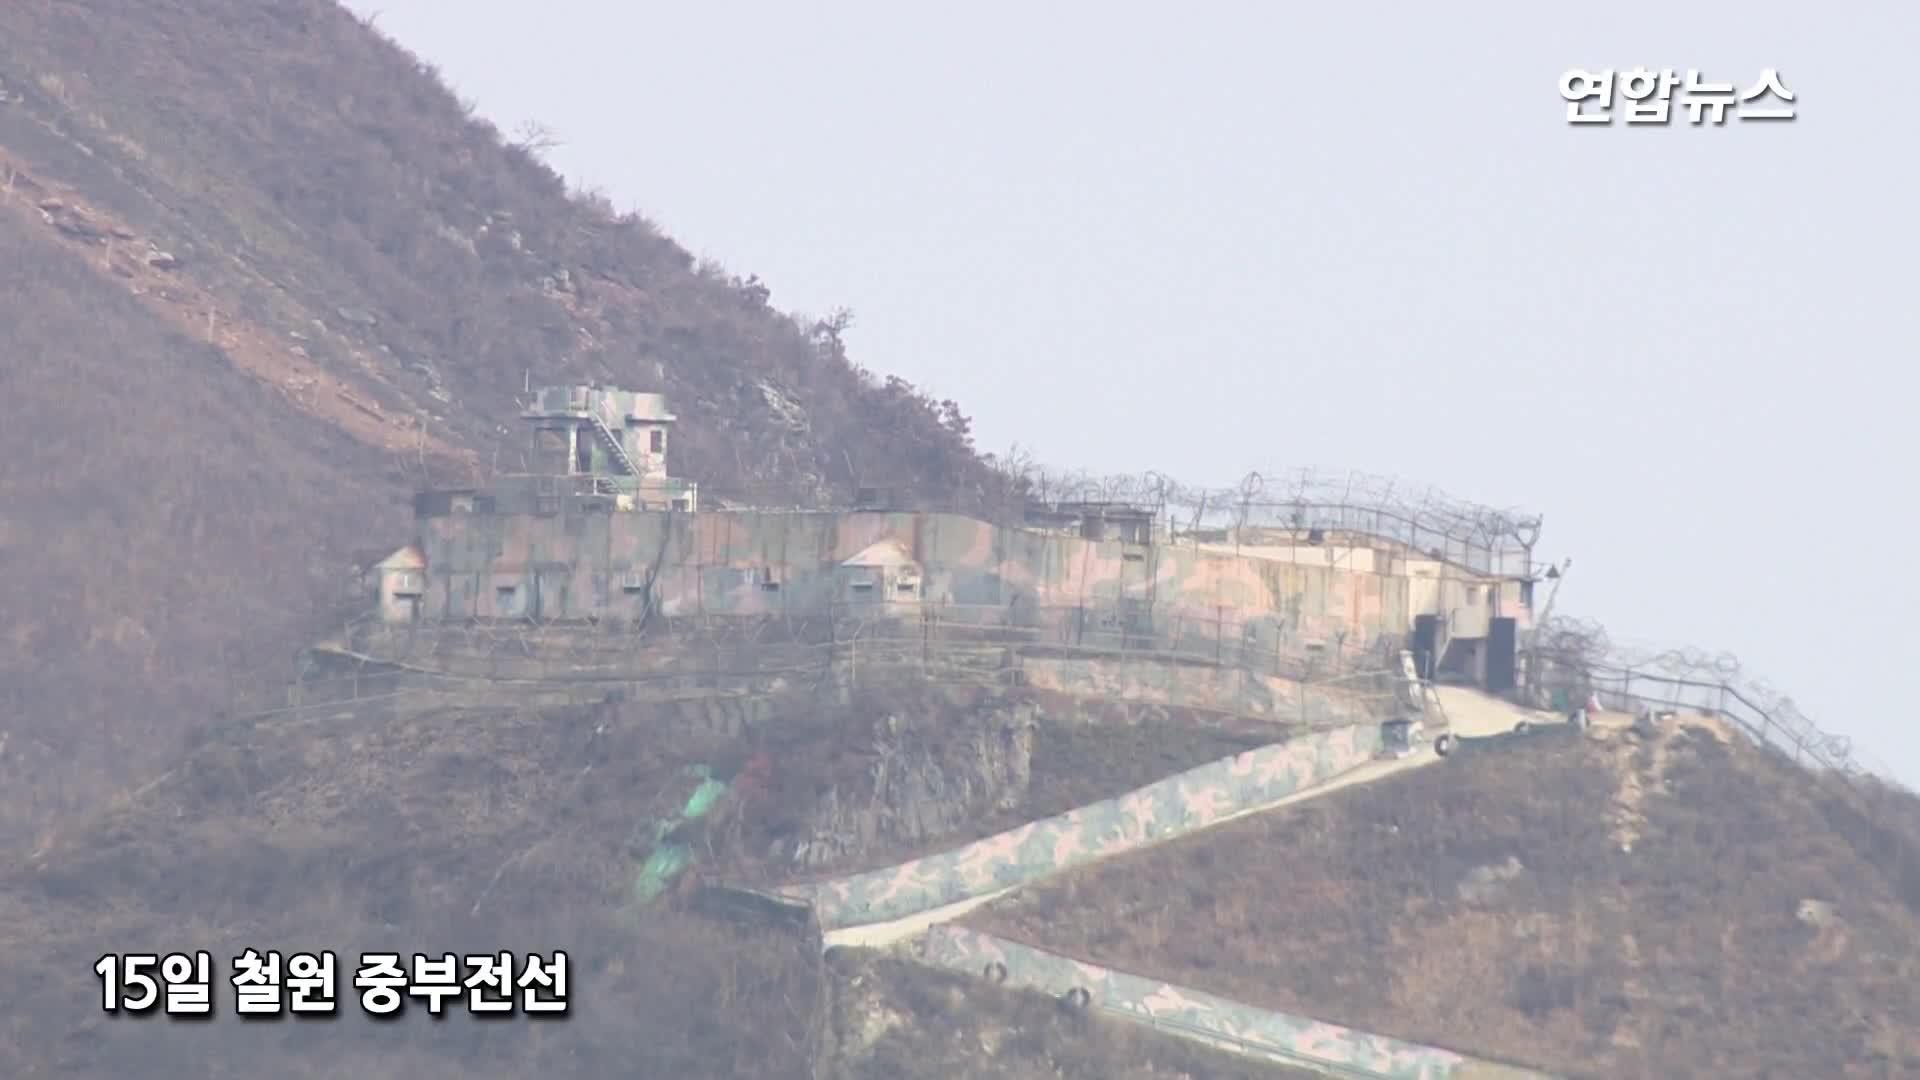 korea, militarygfys, south korea, Cheorwon GP Demolition GIFs